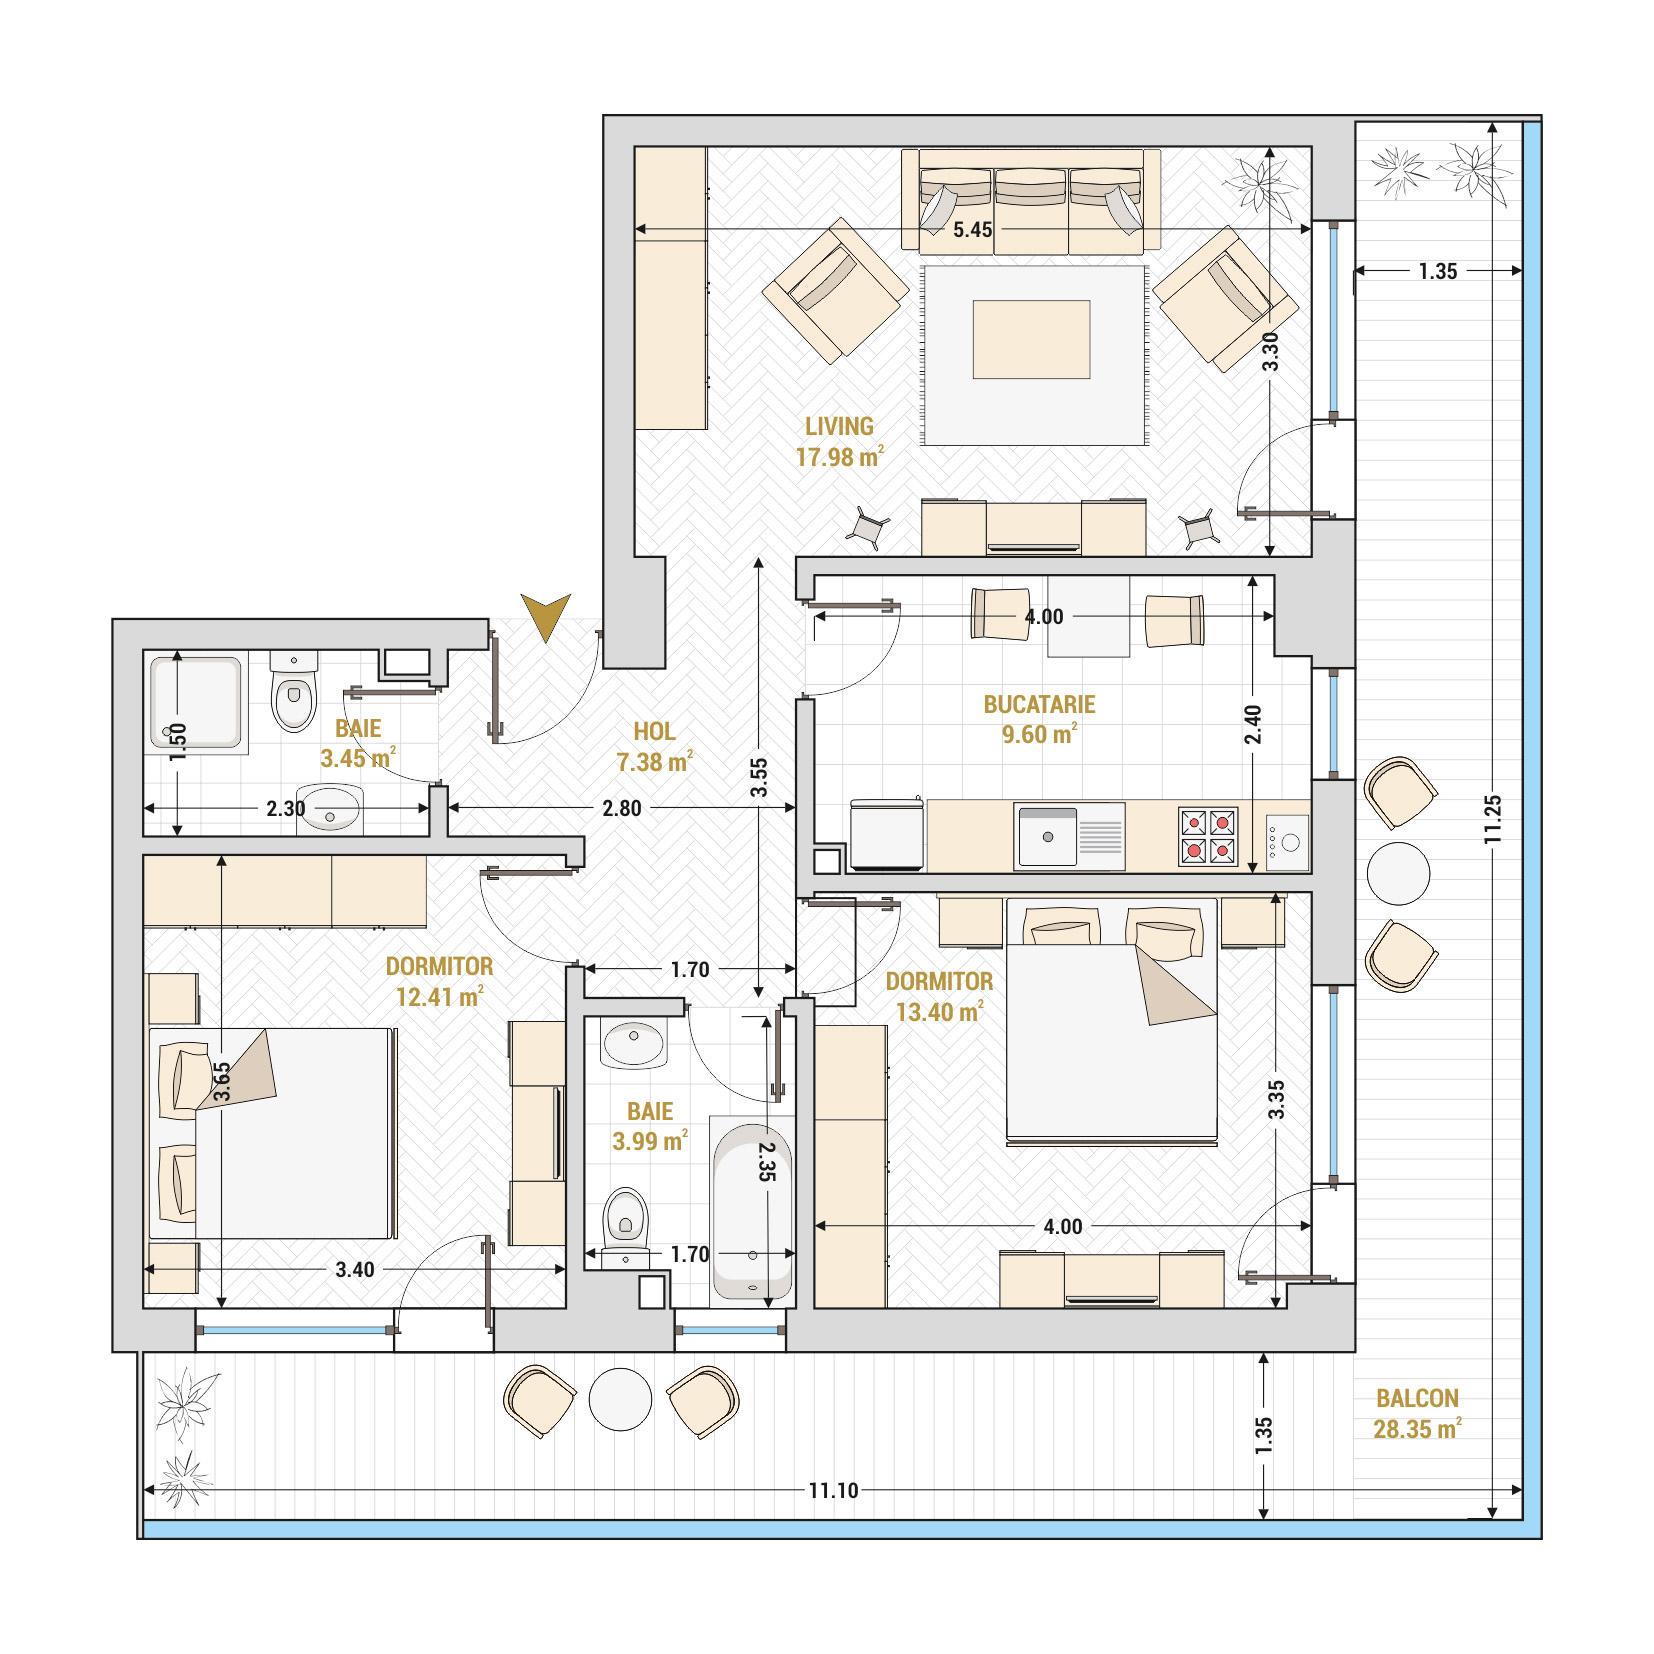 Apartament 3 camere de vanzare Bucuresti - Catedral Residence - Marriott, Piata Unirii, 13 Septembrie, Izvor - Tip 6 - T2